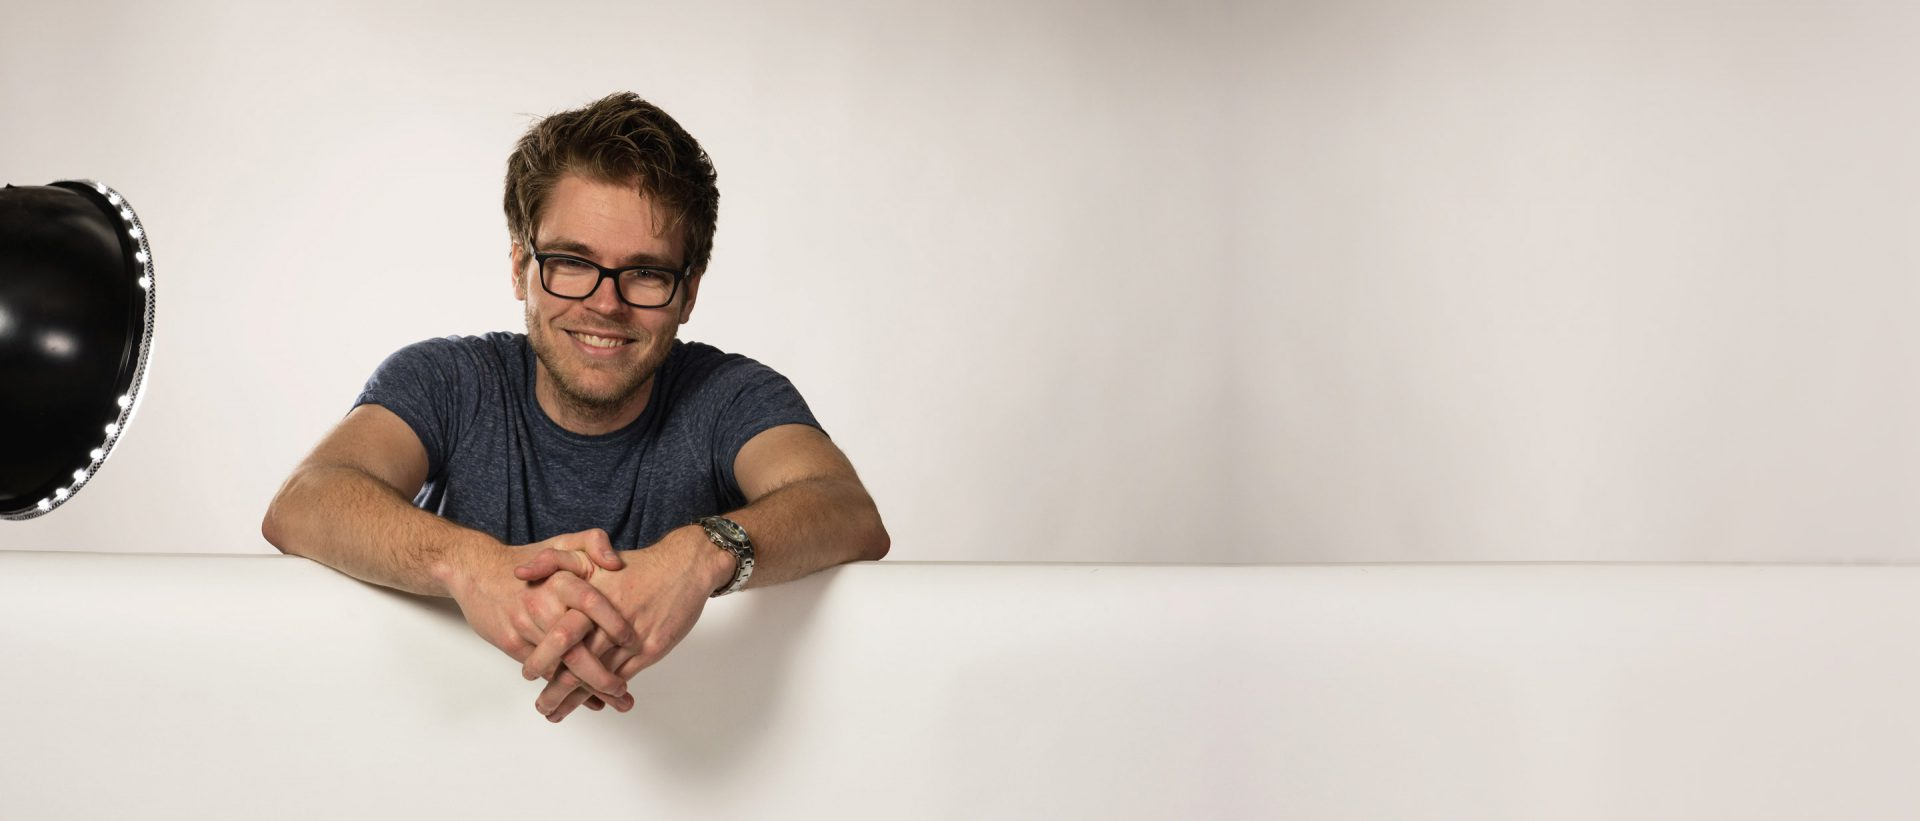 Nick Groeneveld